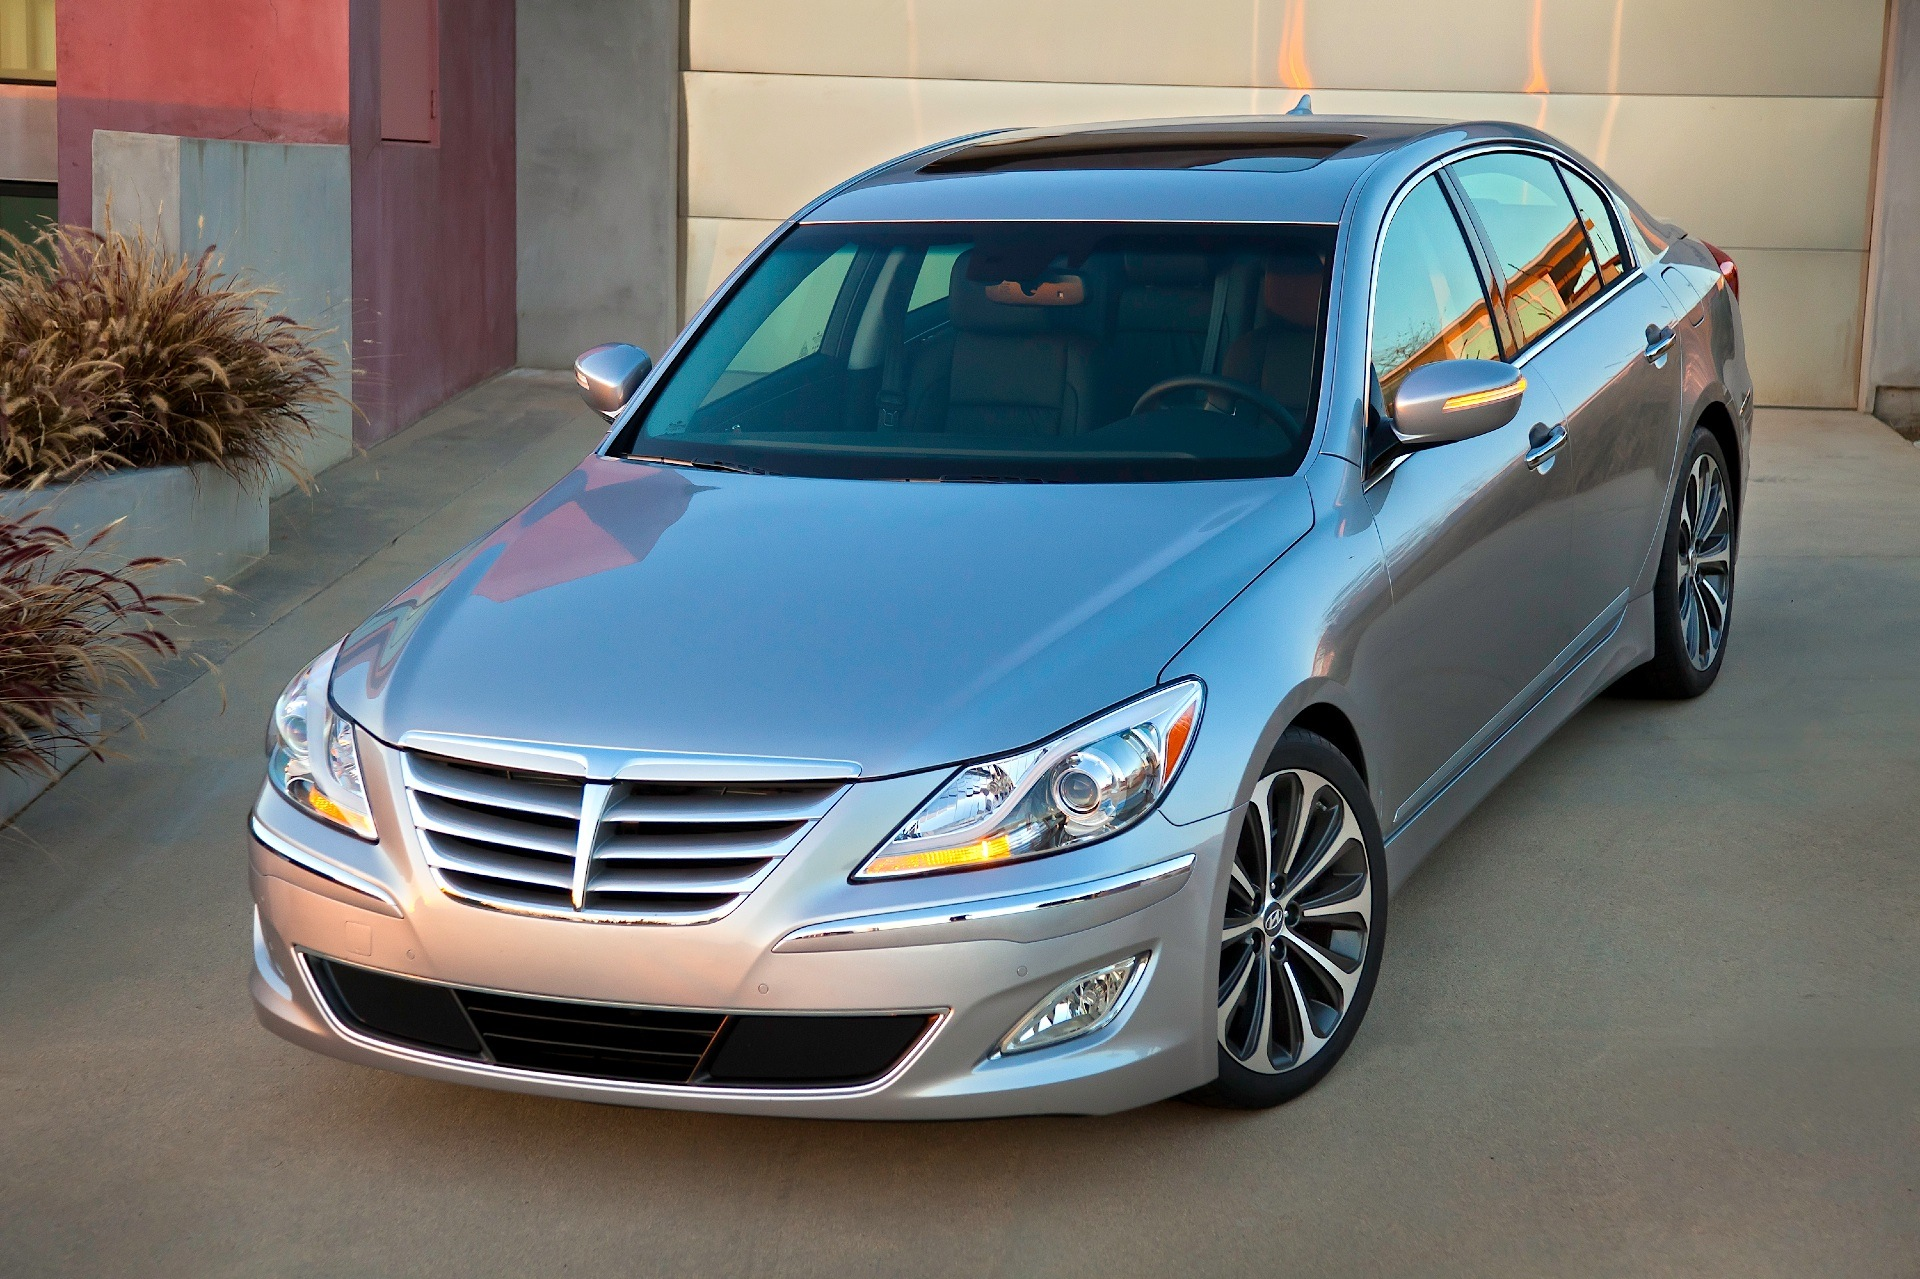 Hyundai Genesis 2008 2009 2010 2011 2012 2013 2014